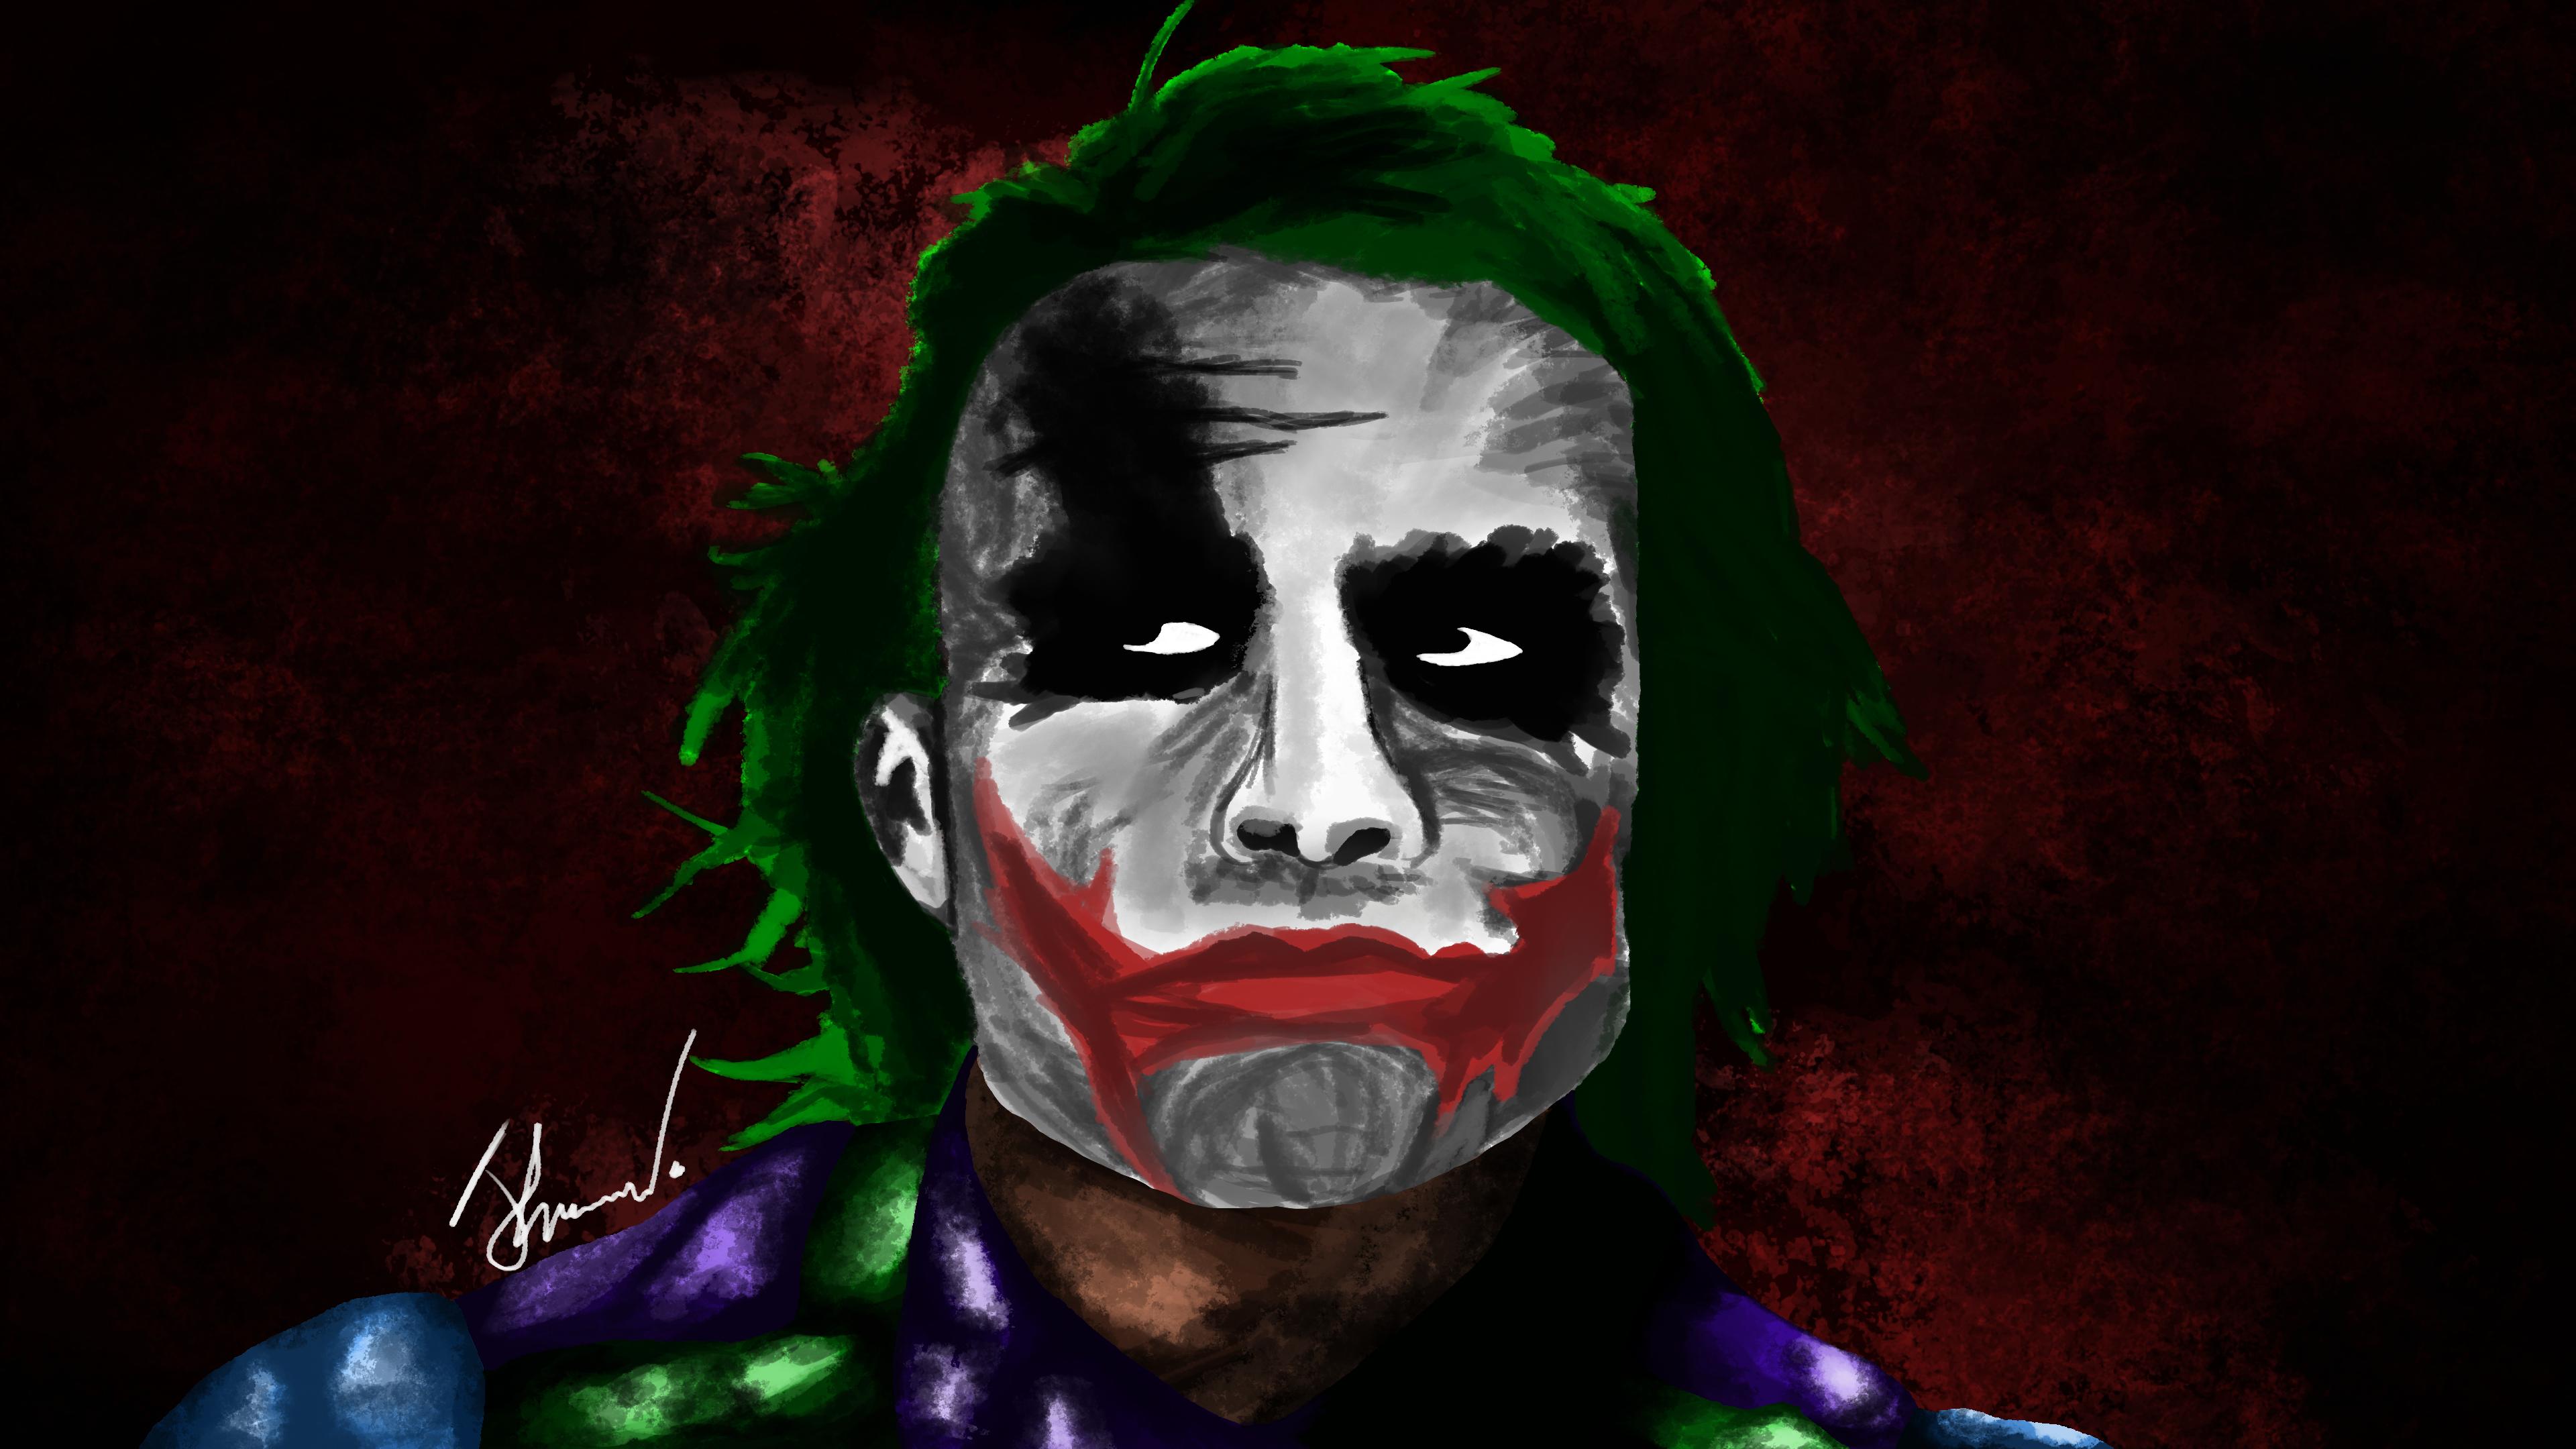 Heath Ledgers' Joker by JarredKeegan on Newgrounds